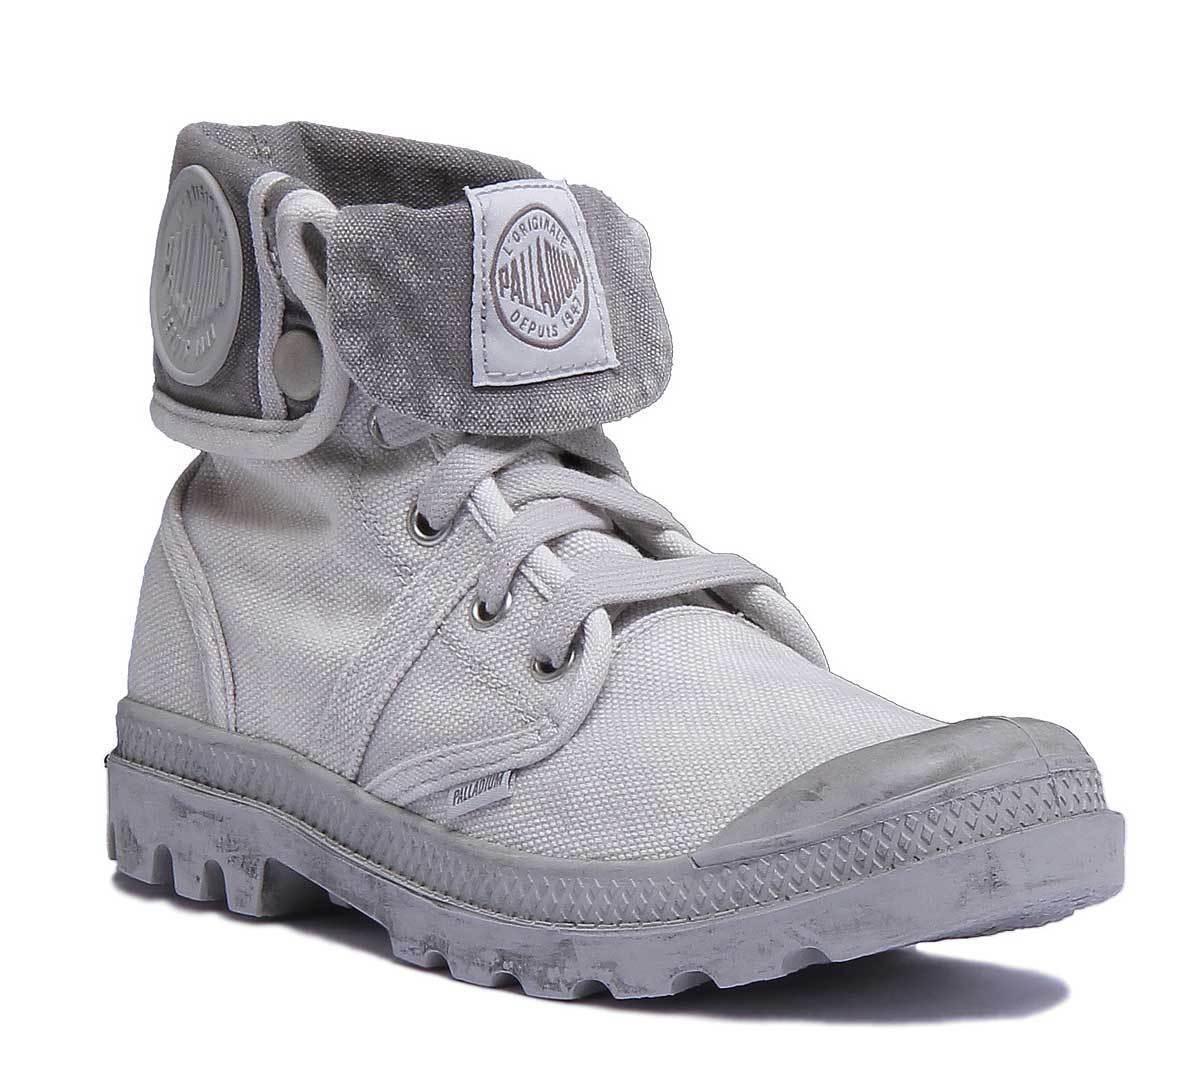 Palladium Pallabrouse Bag Damenschuhe Grau Canvas Stiefel Größe UK 3 - 8